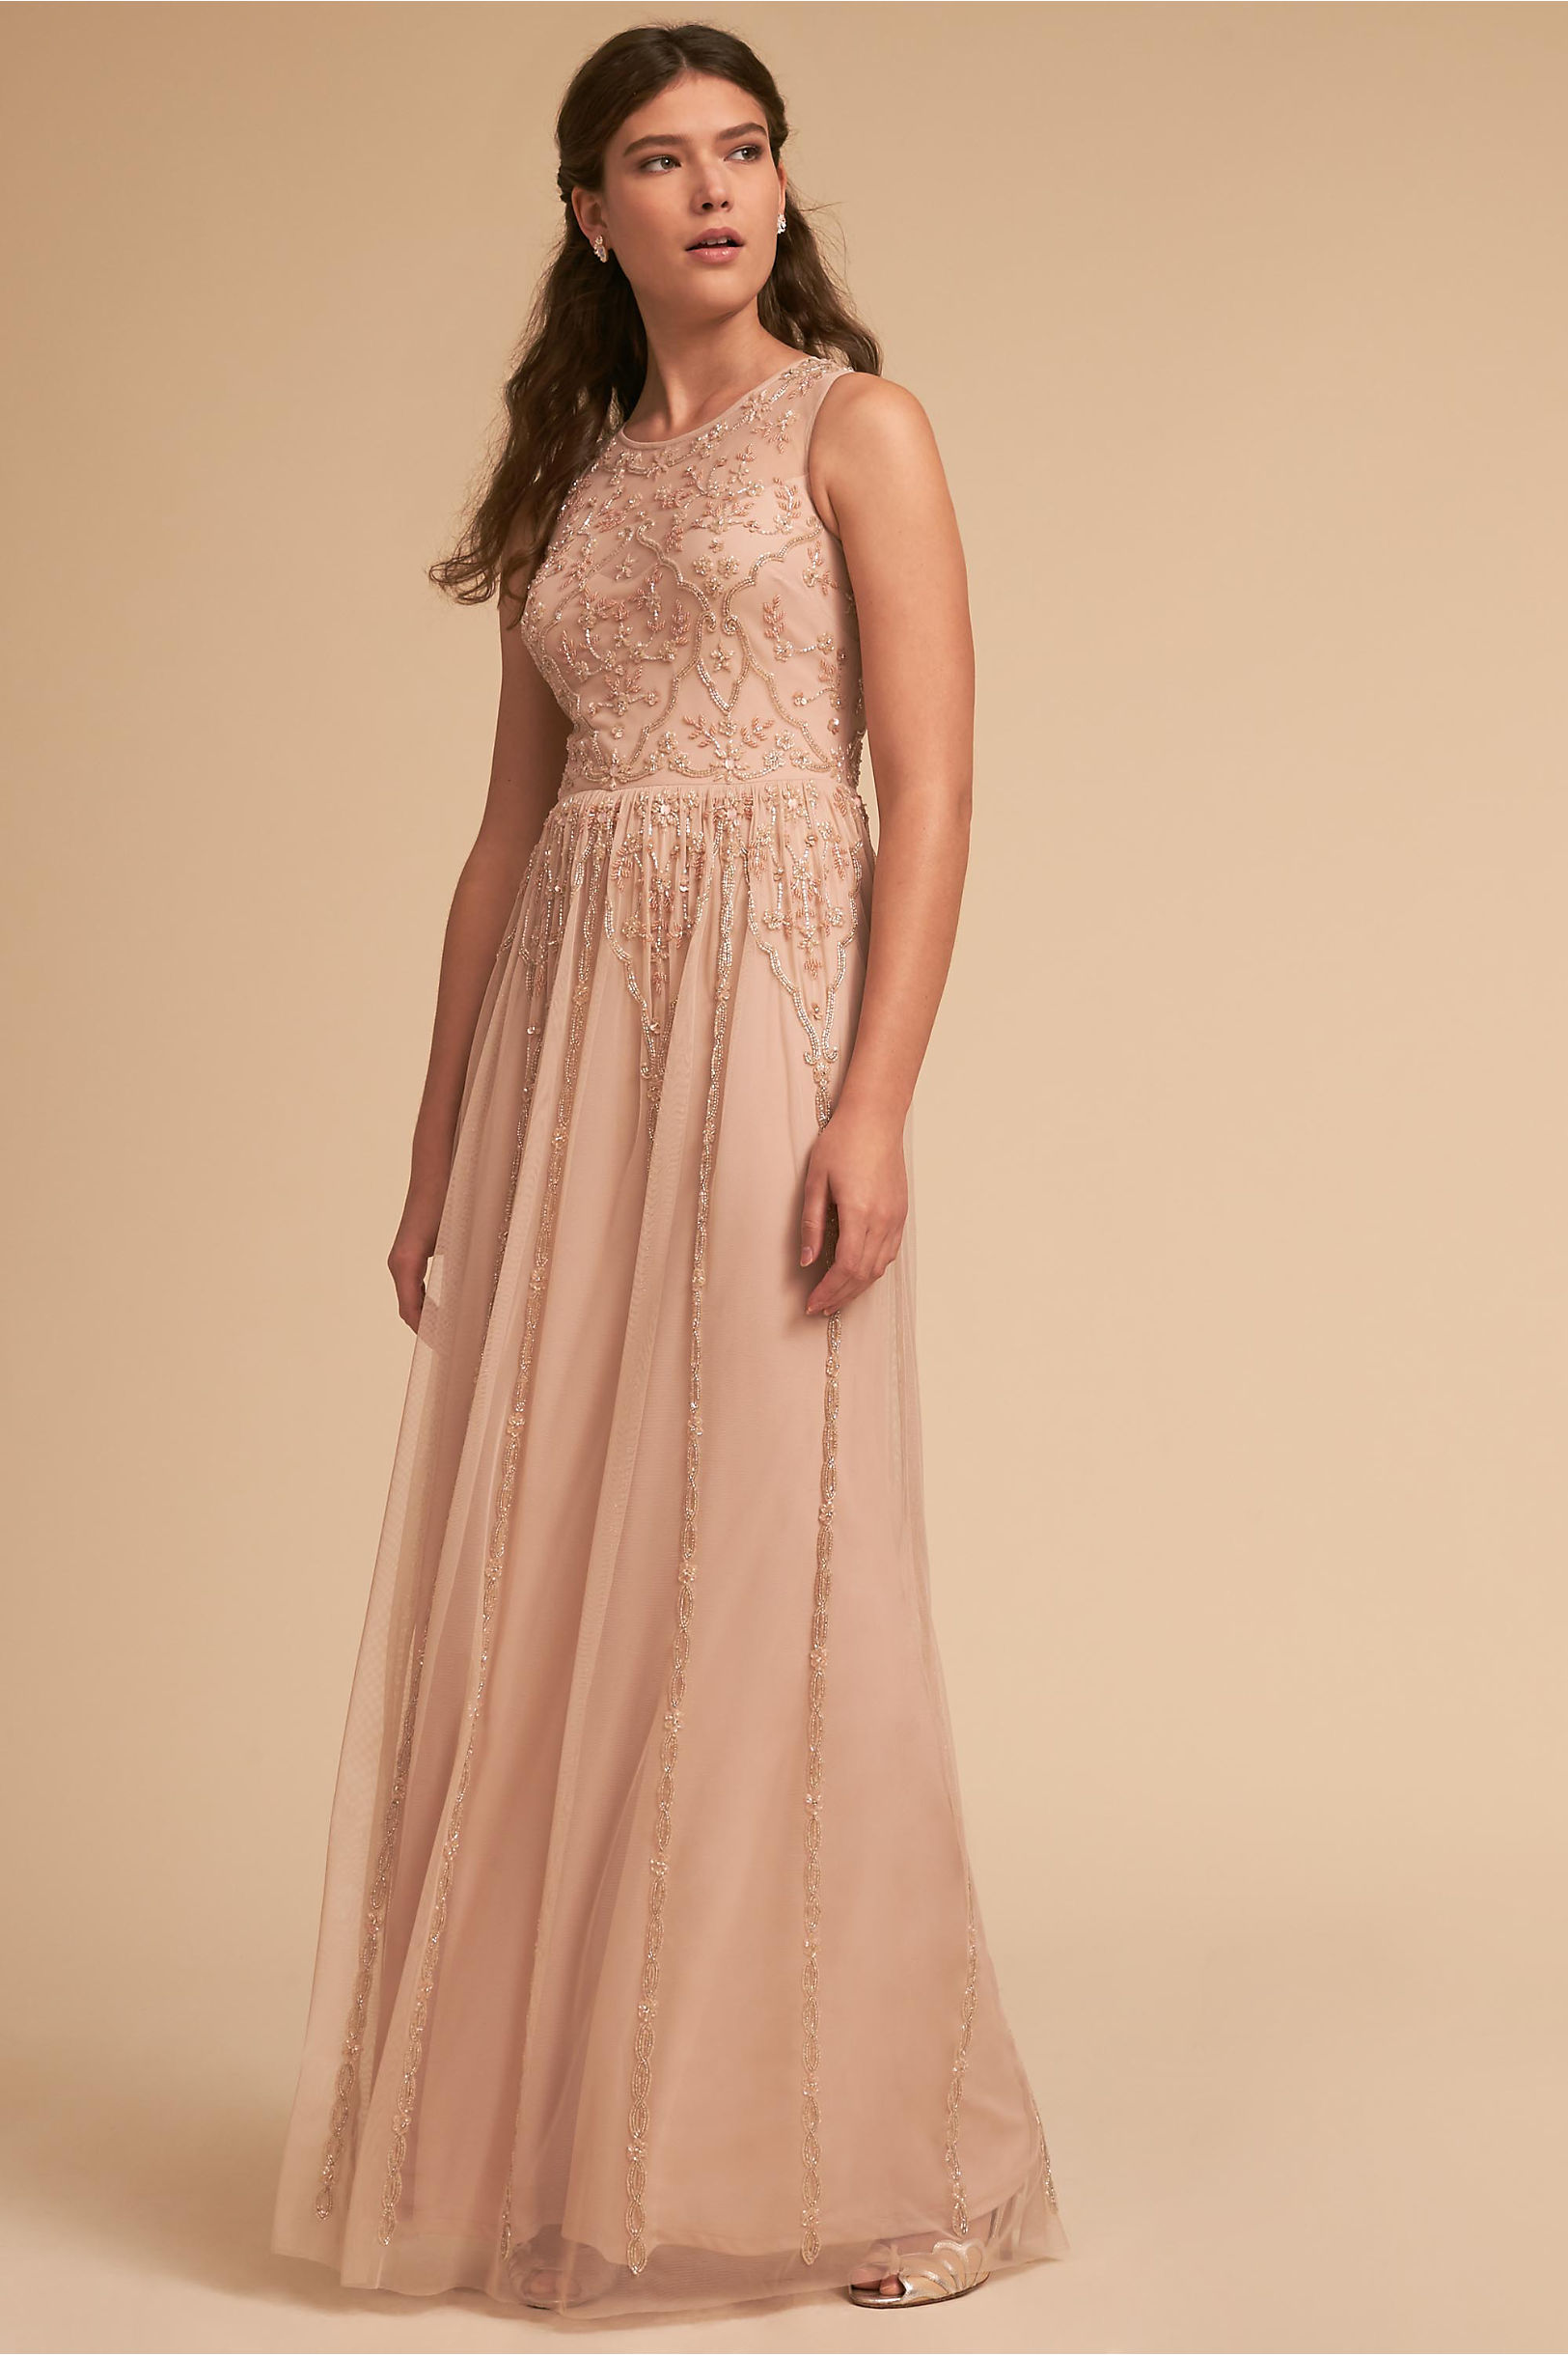 mother of the bride dresses long length, short length, and tea length, long mother of the bride dresses